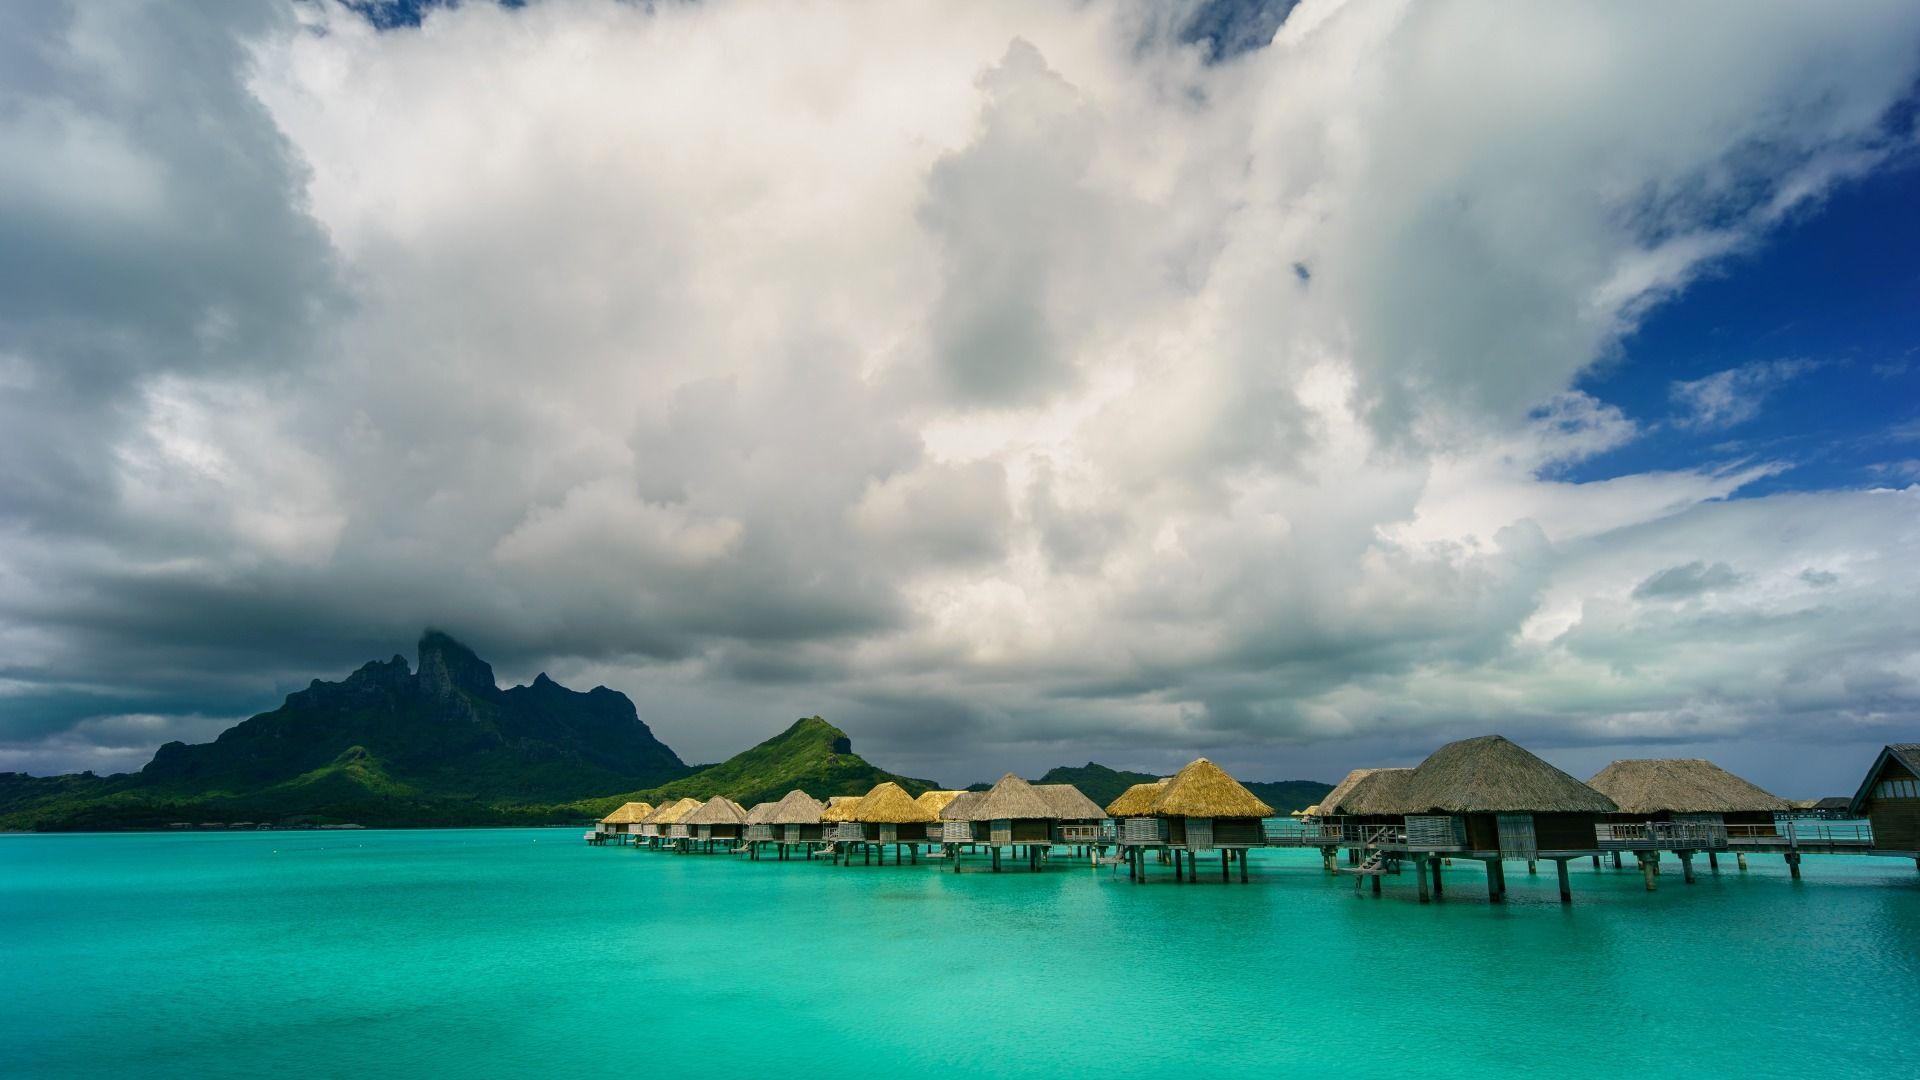 Bora Bora wallpaper download